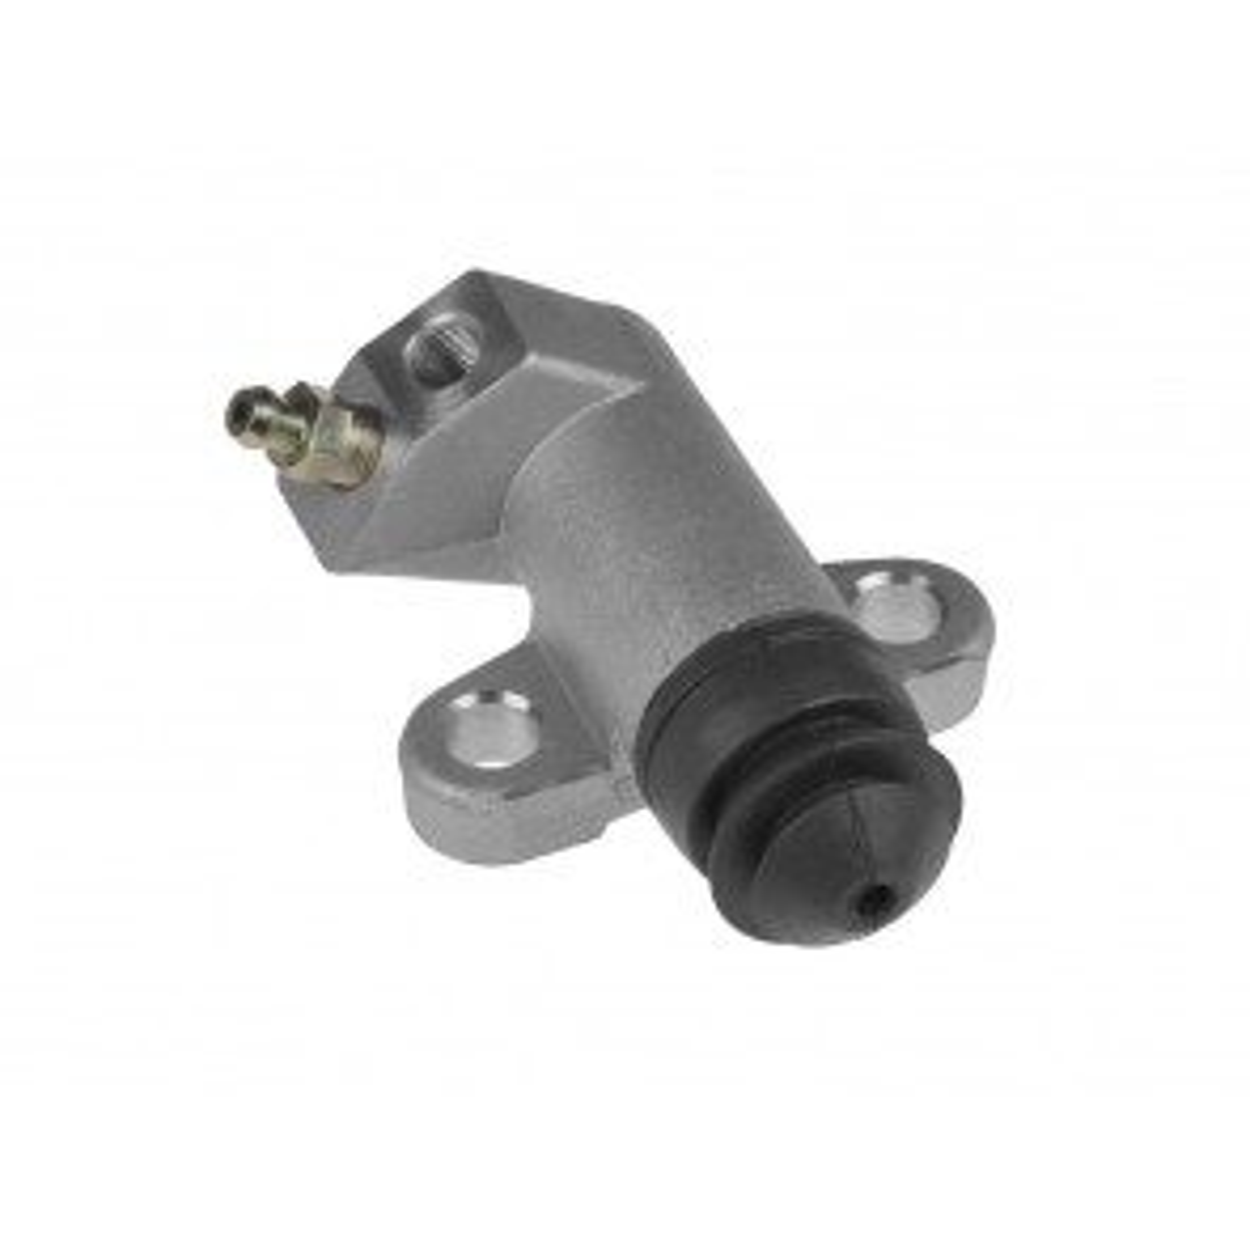 OE Equivalent Clutch Slave Cylinder For Nissan Silvia S13 180SX 200SX S14 Skyline R32 R33 R34